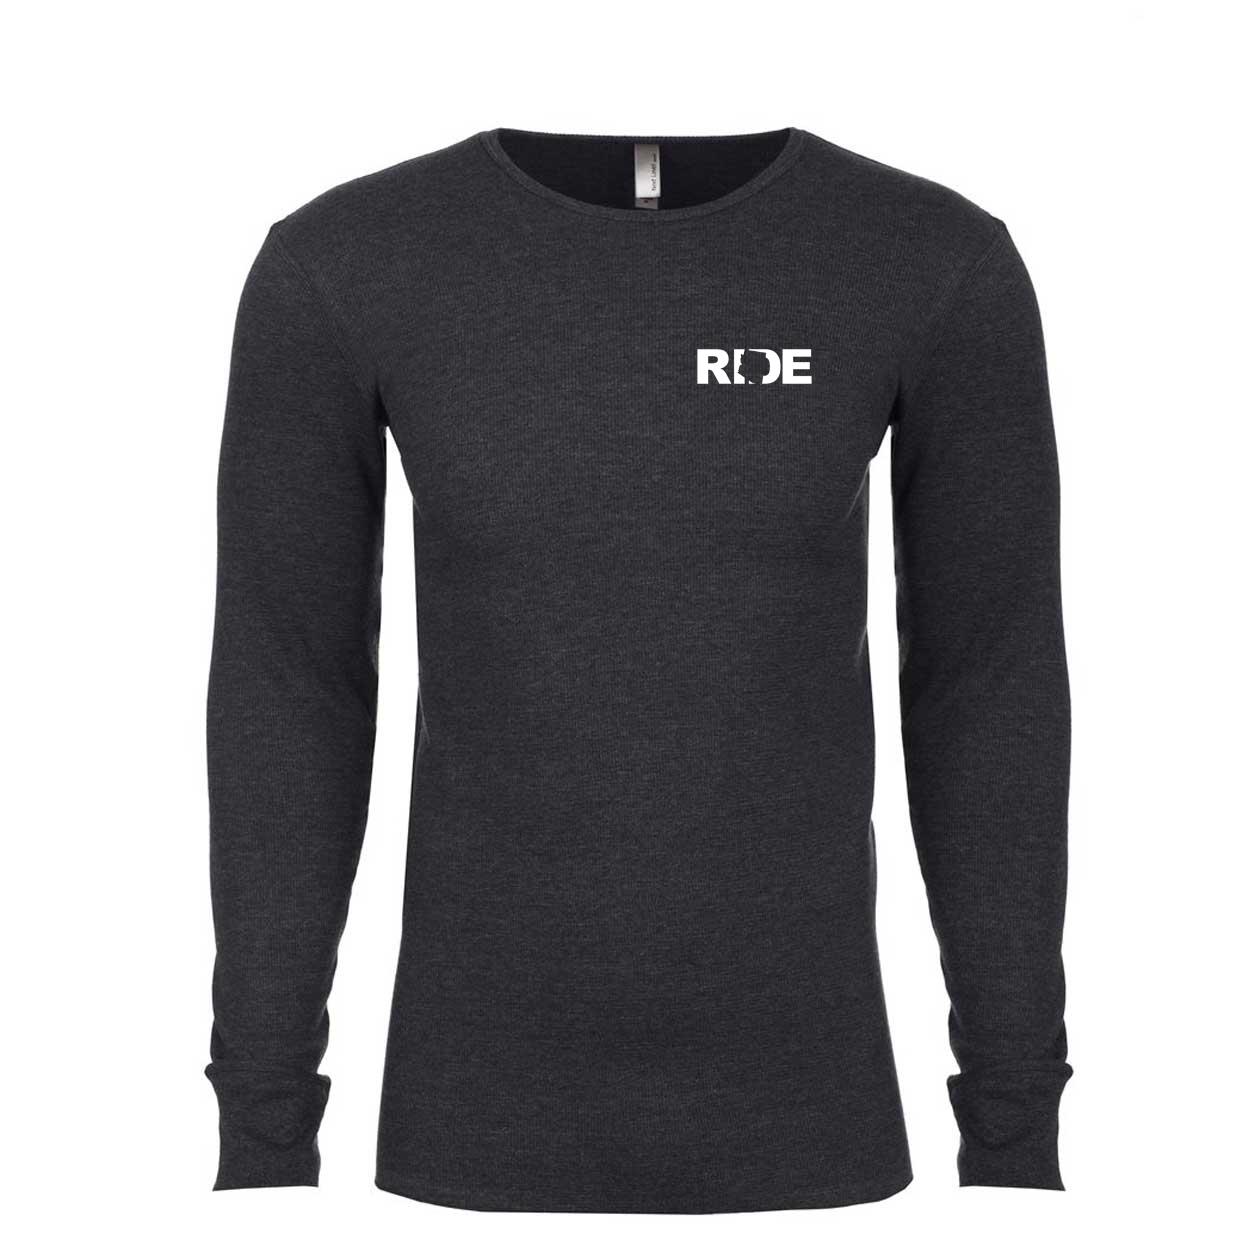 Ride Arizona Long Sleeve Thermal Shirt Heather Charcoal (White Logo)